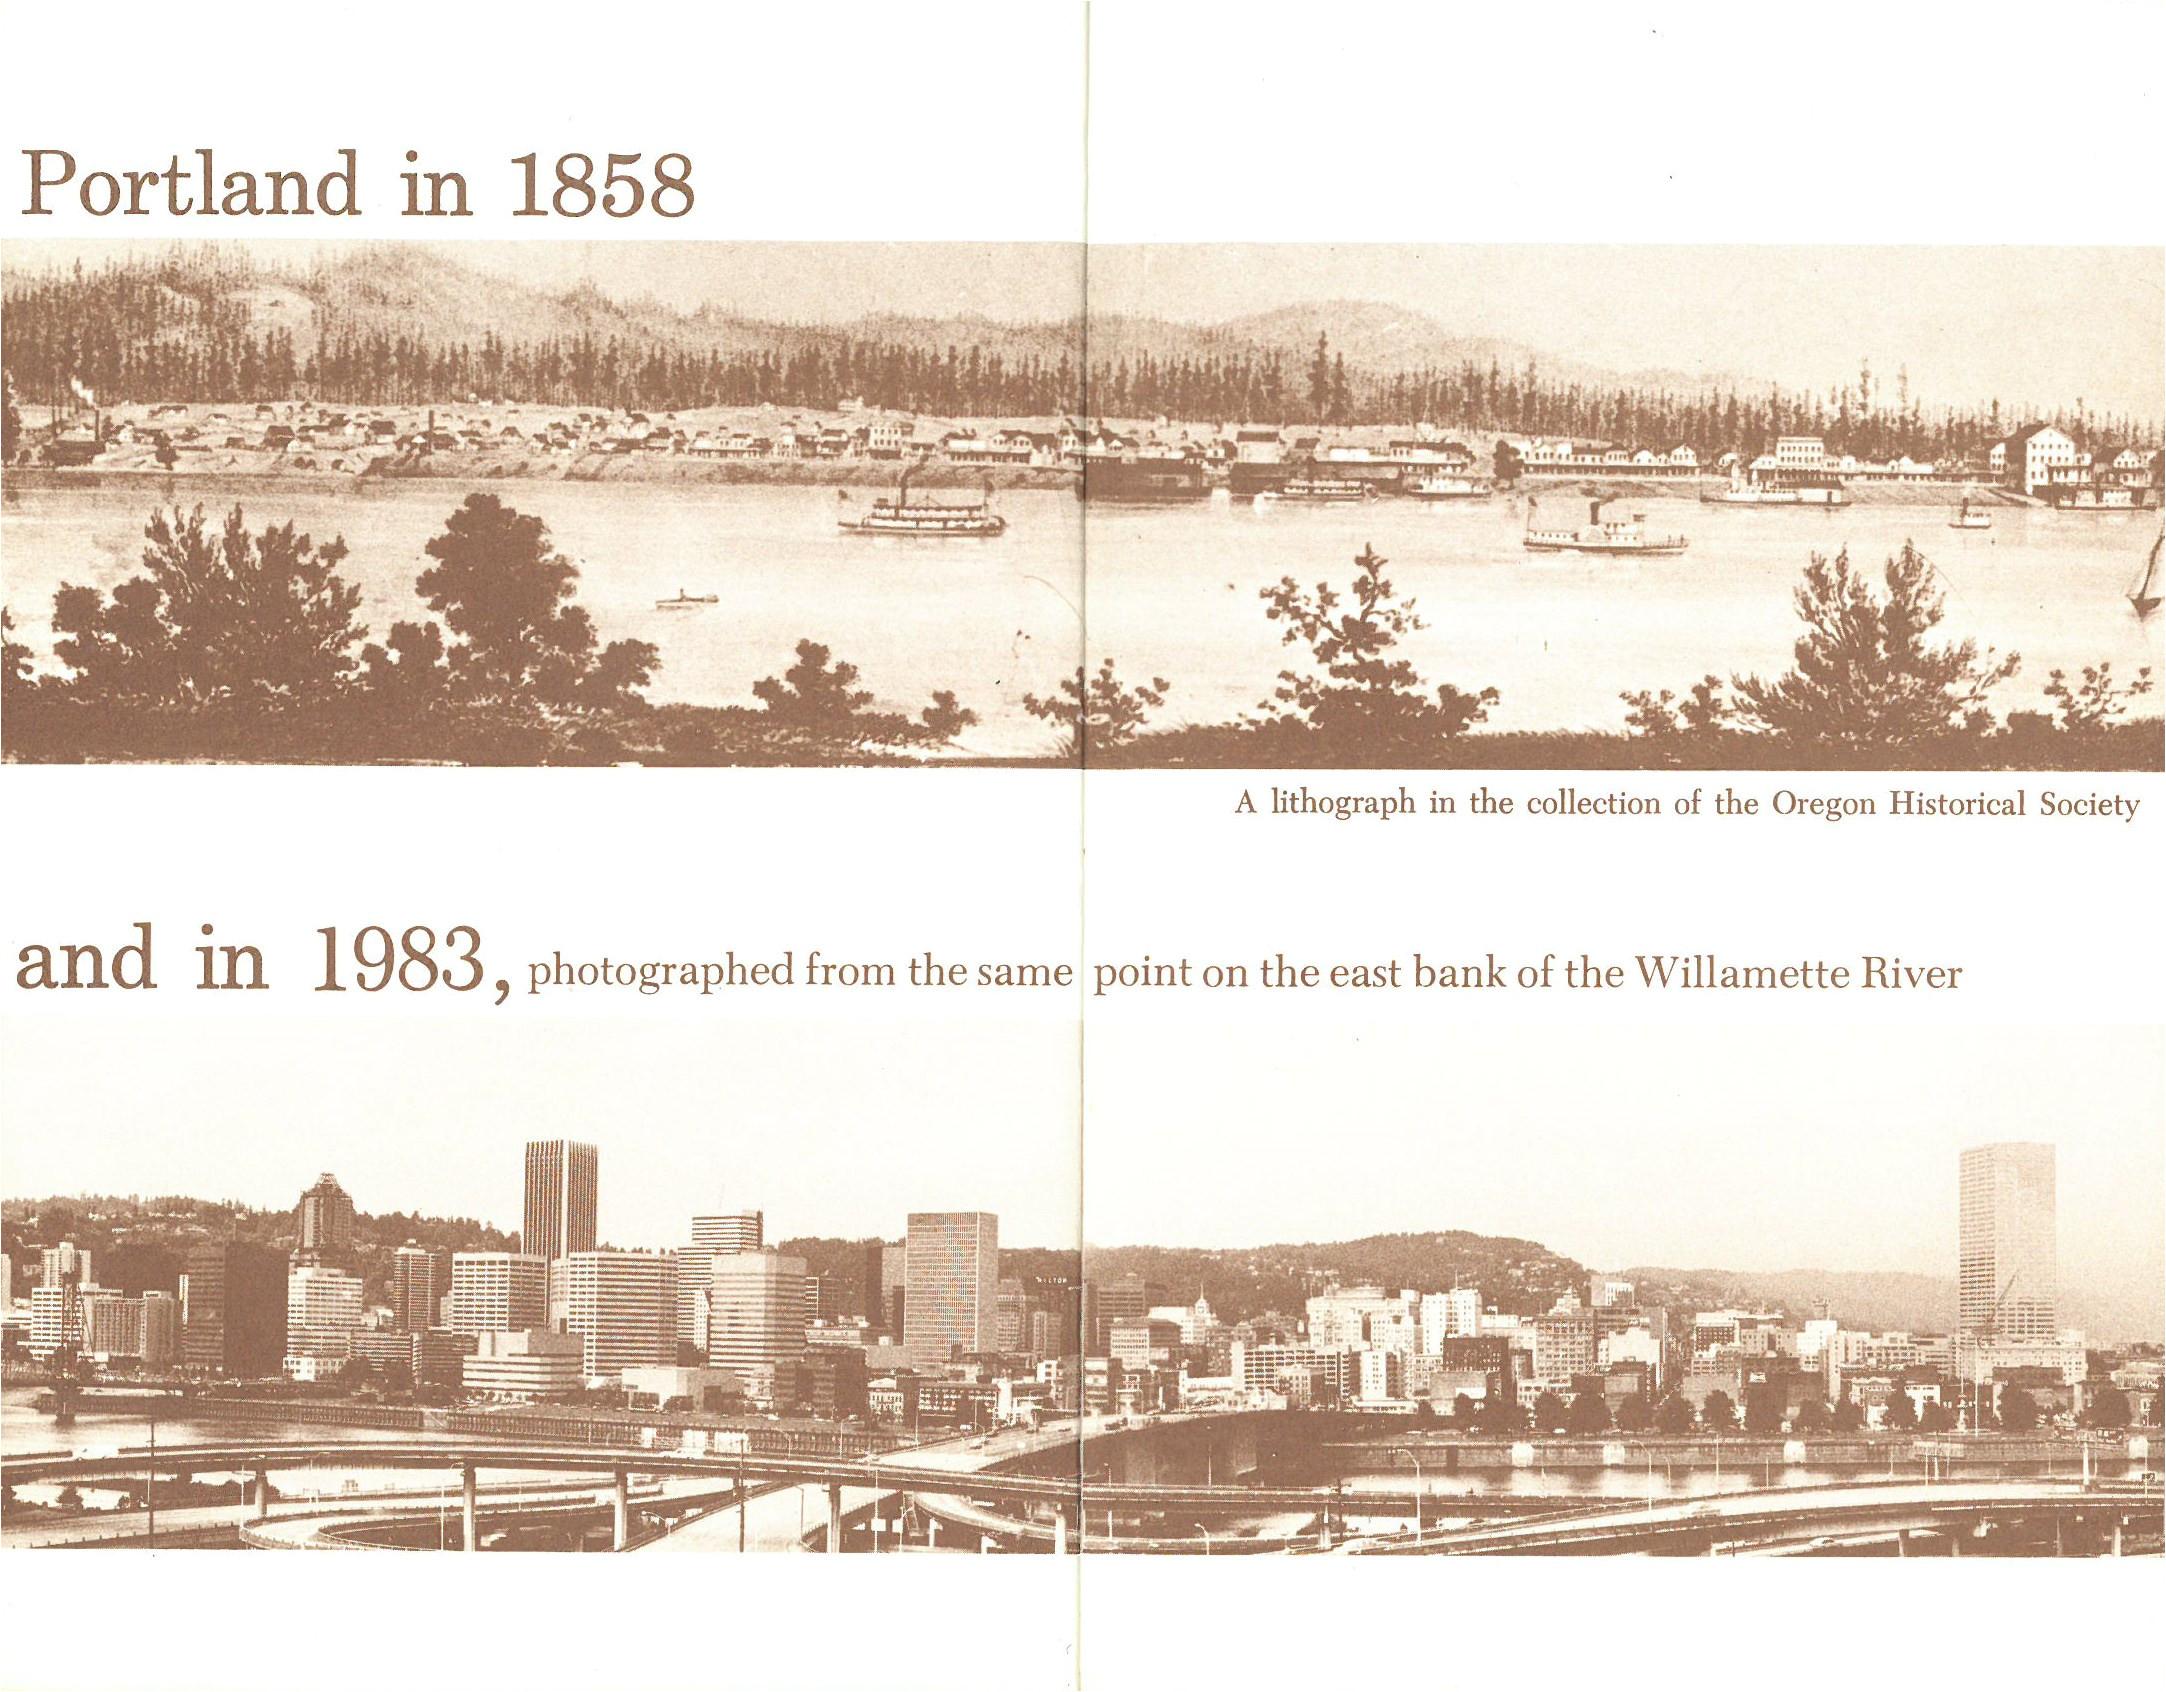 header image comparing 1858 portland to 1983 portland from synder inner leaf